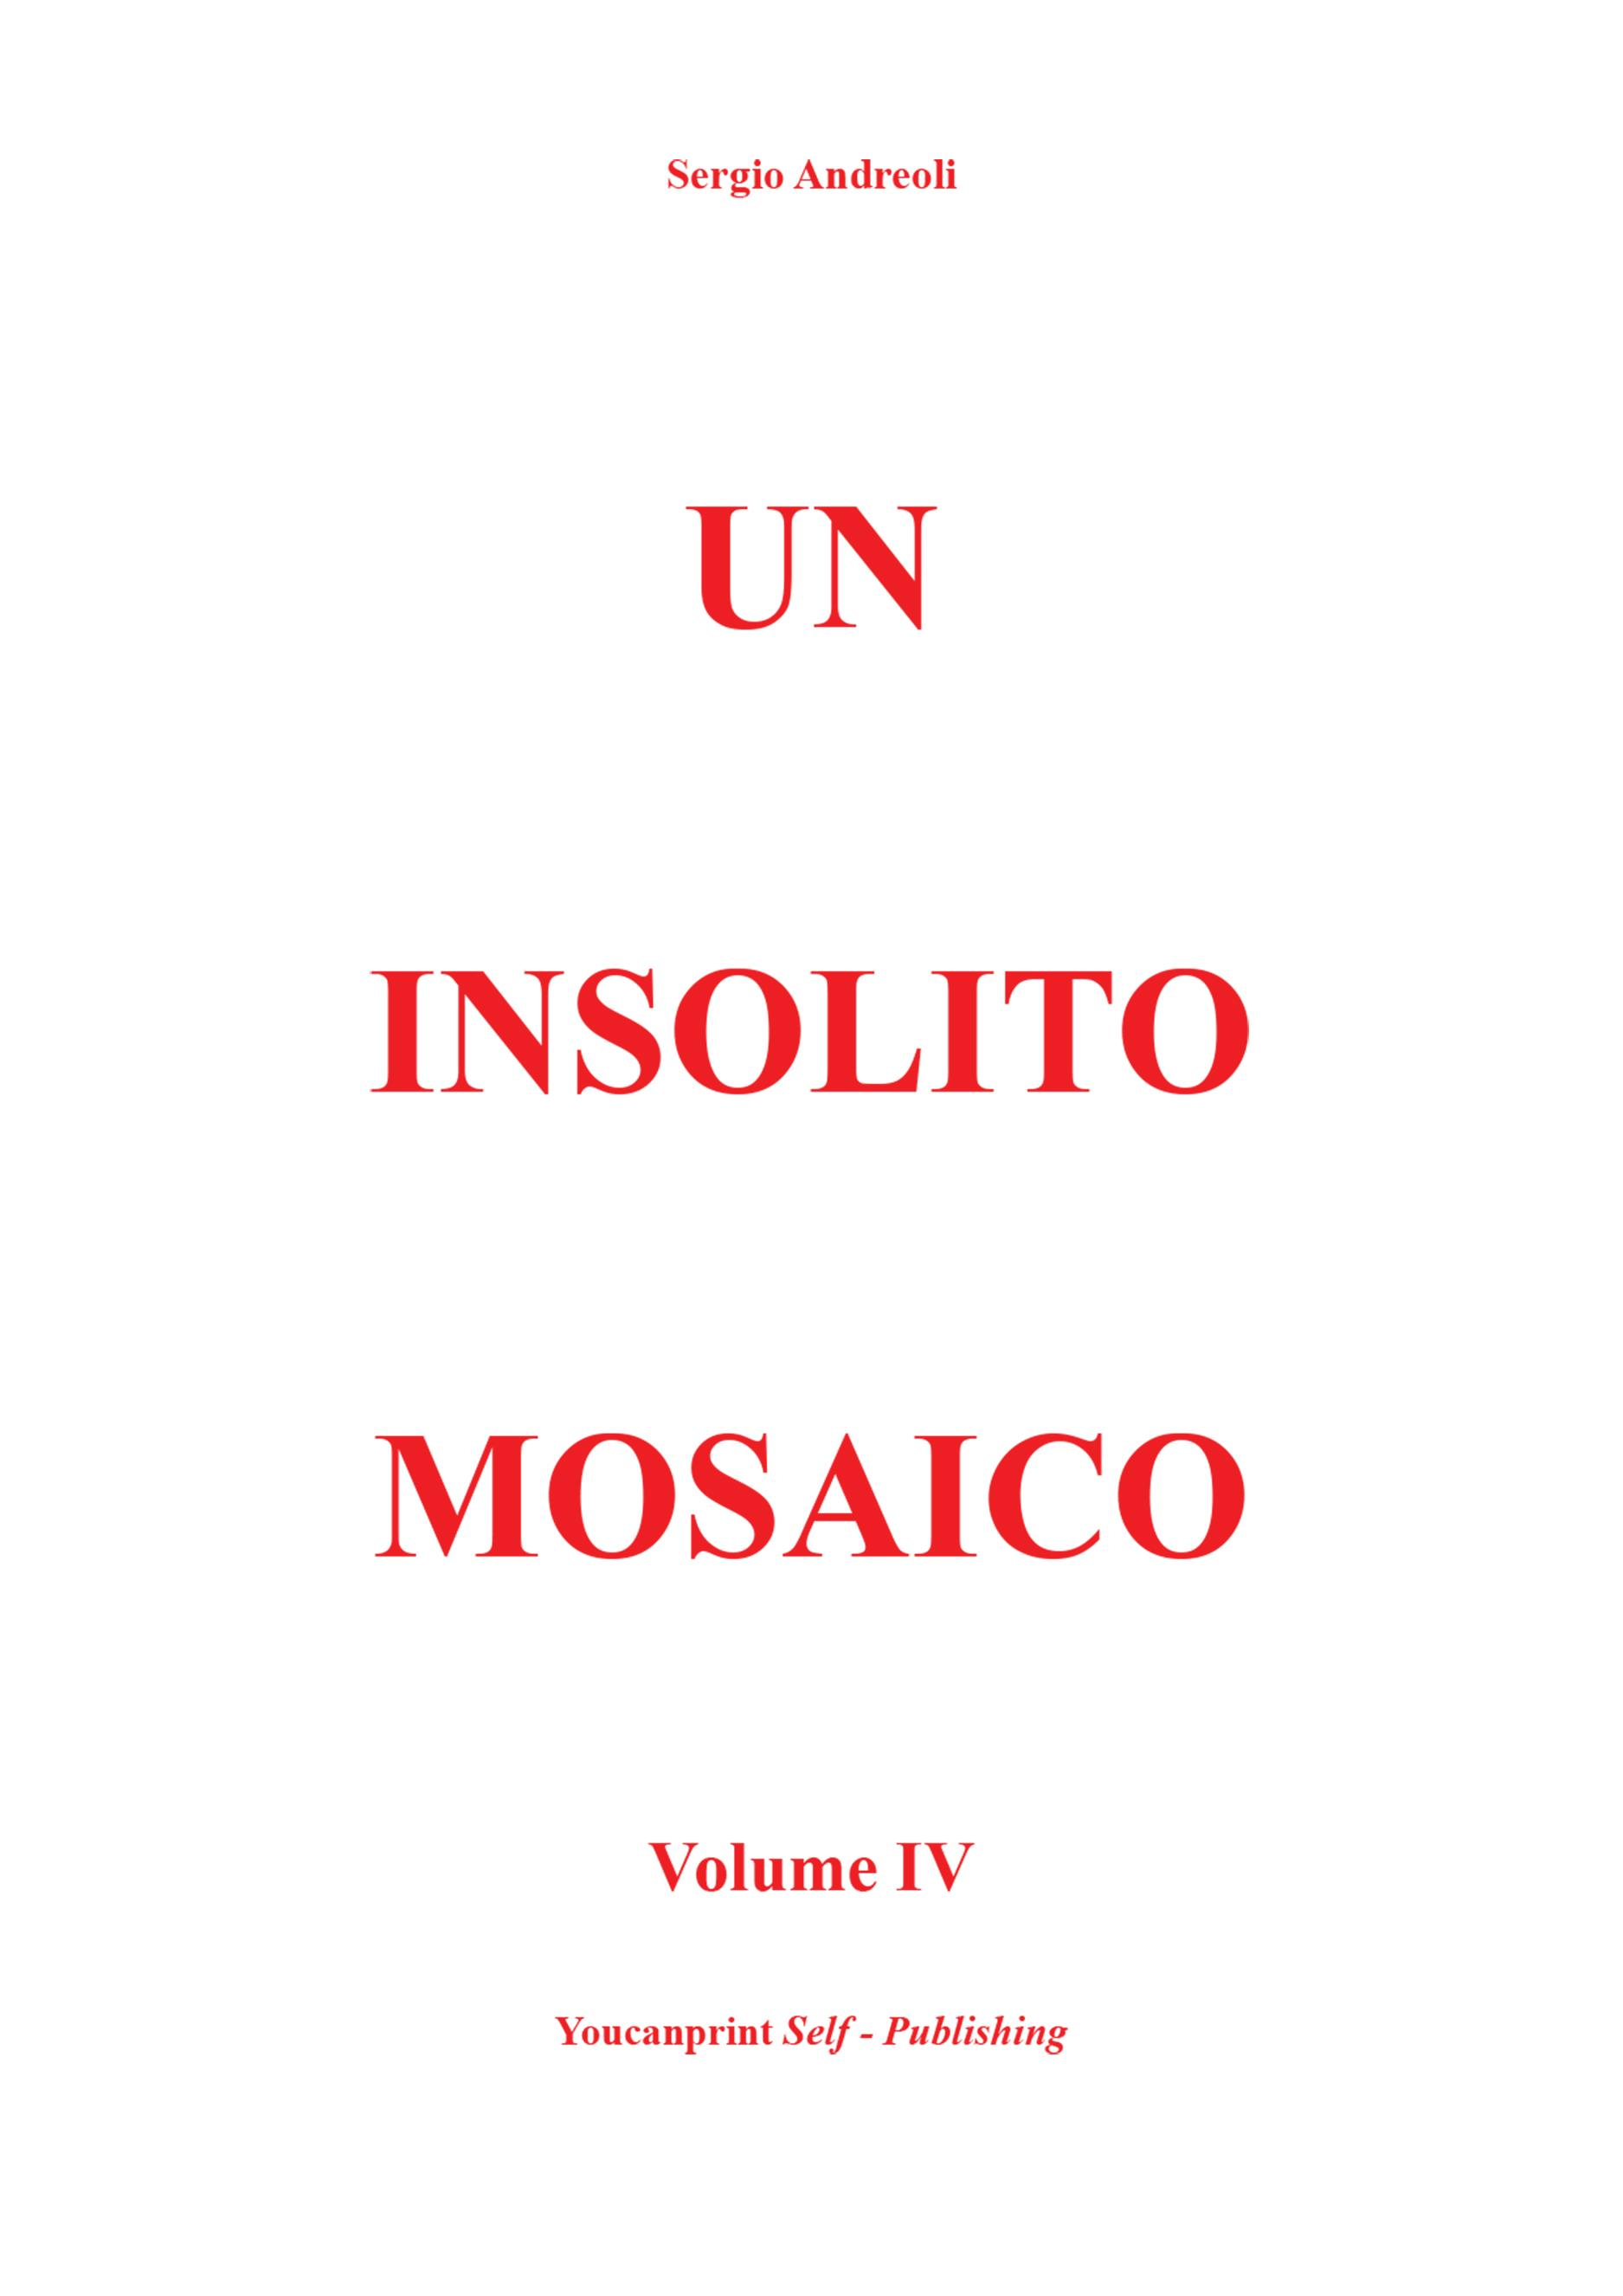 Un insolito mosaico Vol. 4